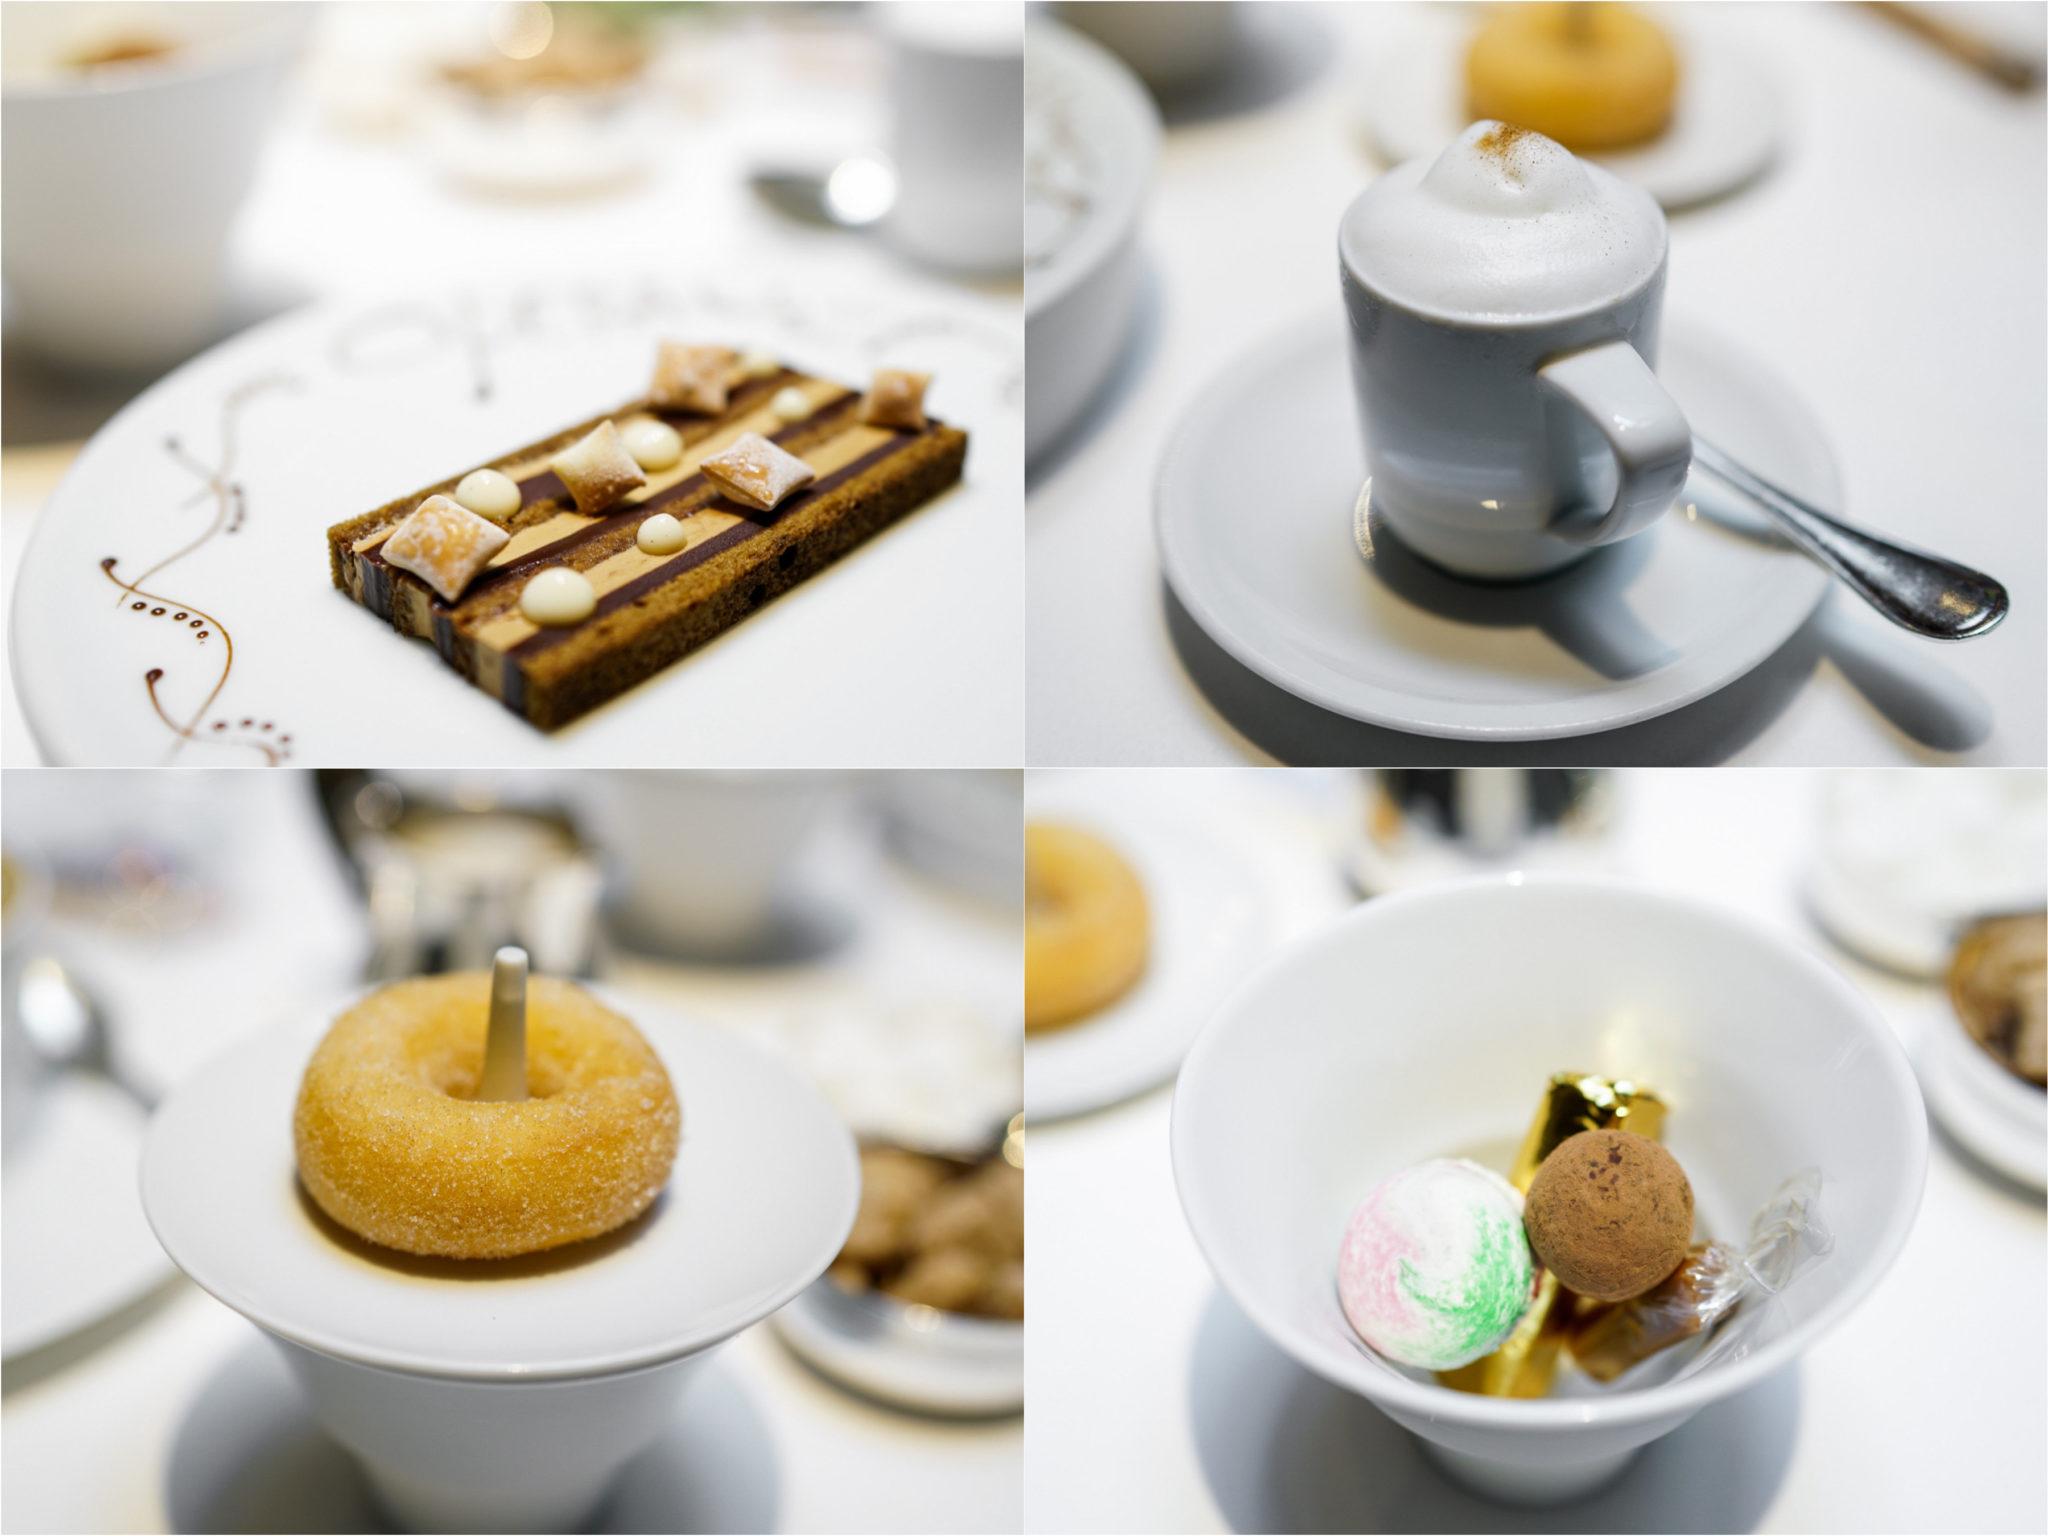 "Gateau Opera, bisciut joconde and Valrhona chocolate Ganache; ""cappuccino semi-freddo; cinnamon-sugared doughnuts; macarons, candies and chocolates"